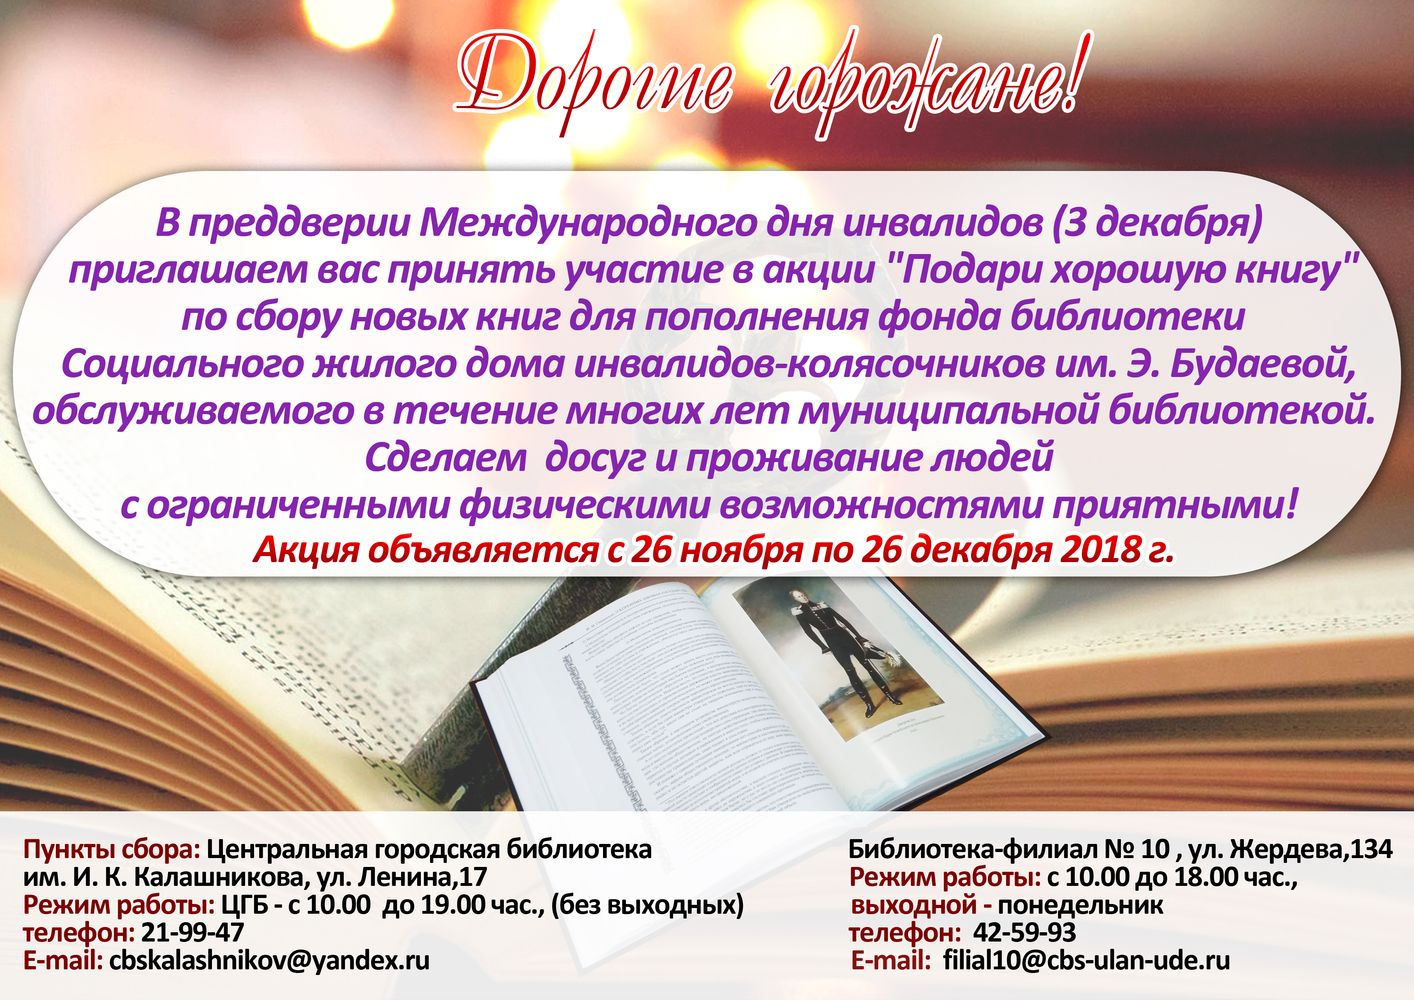 «Подари хорошую книгу»